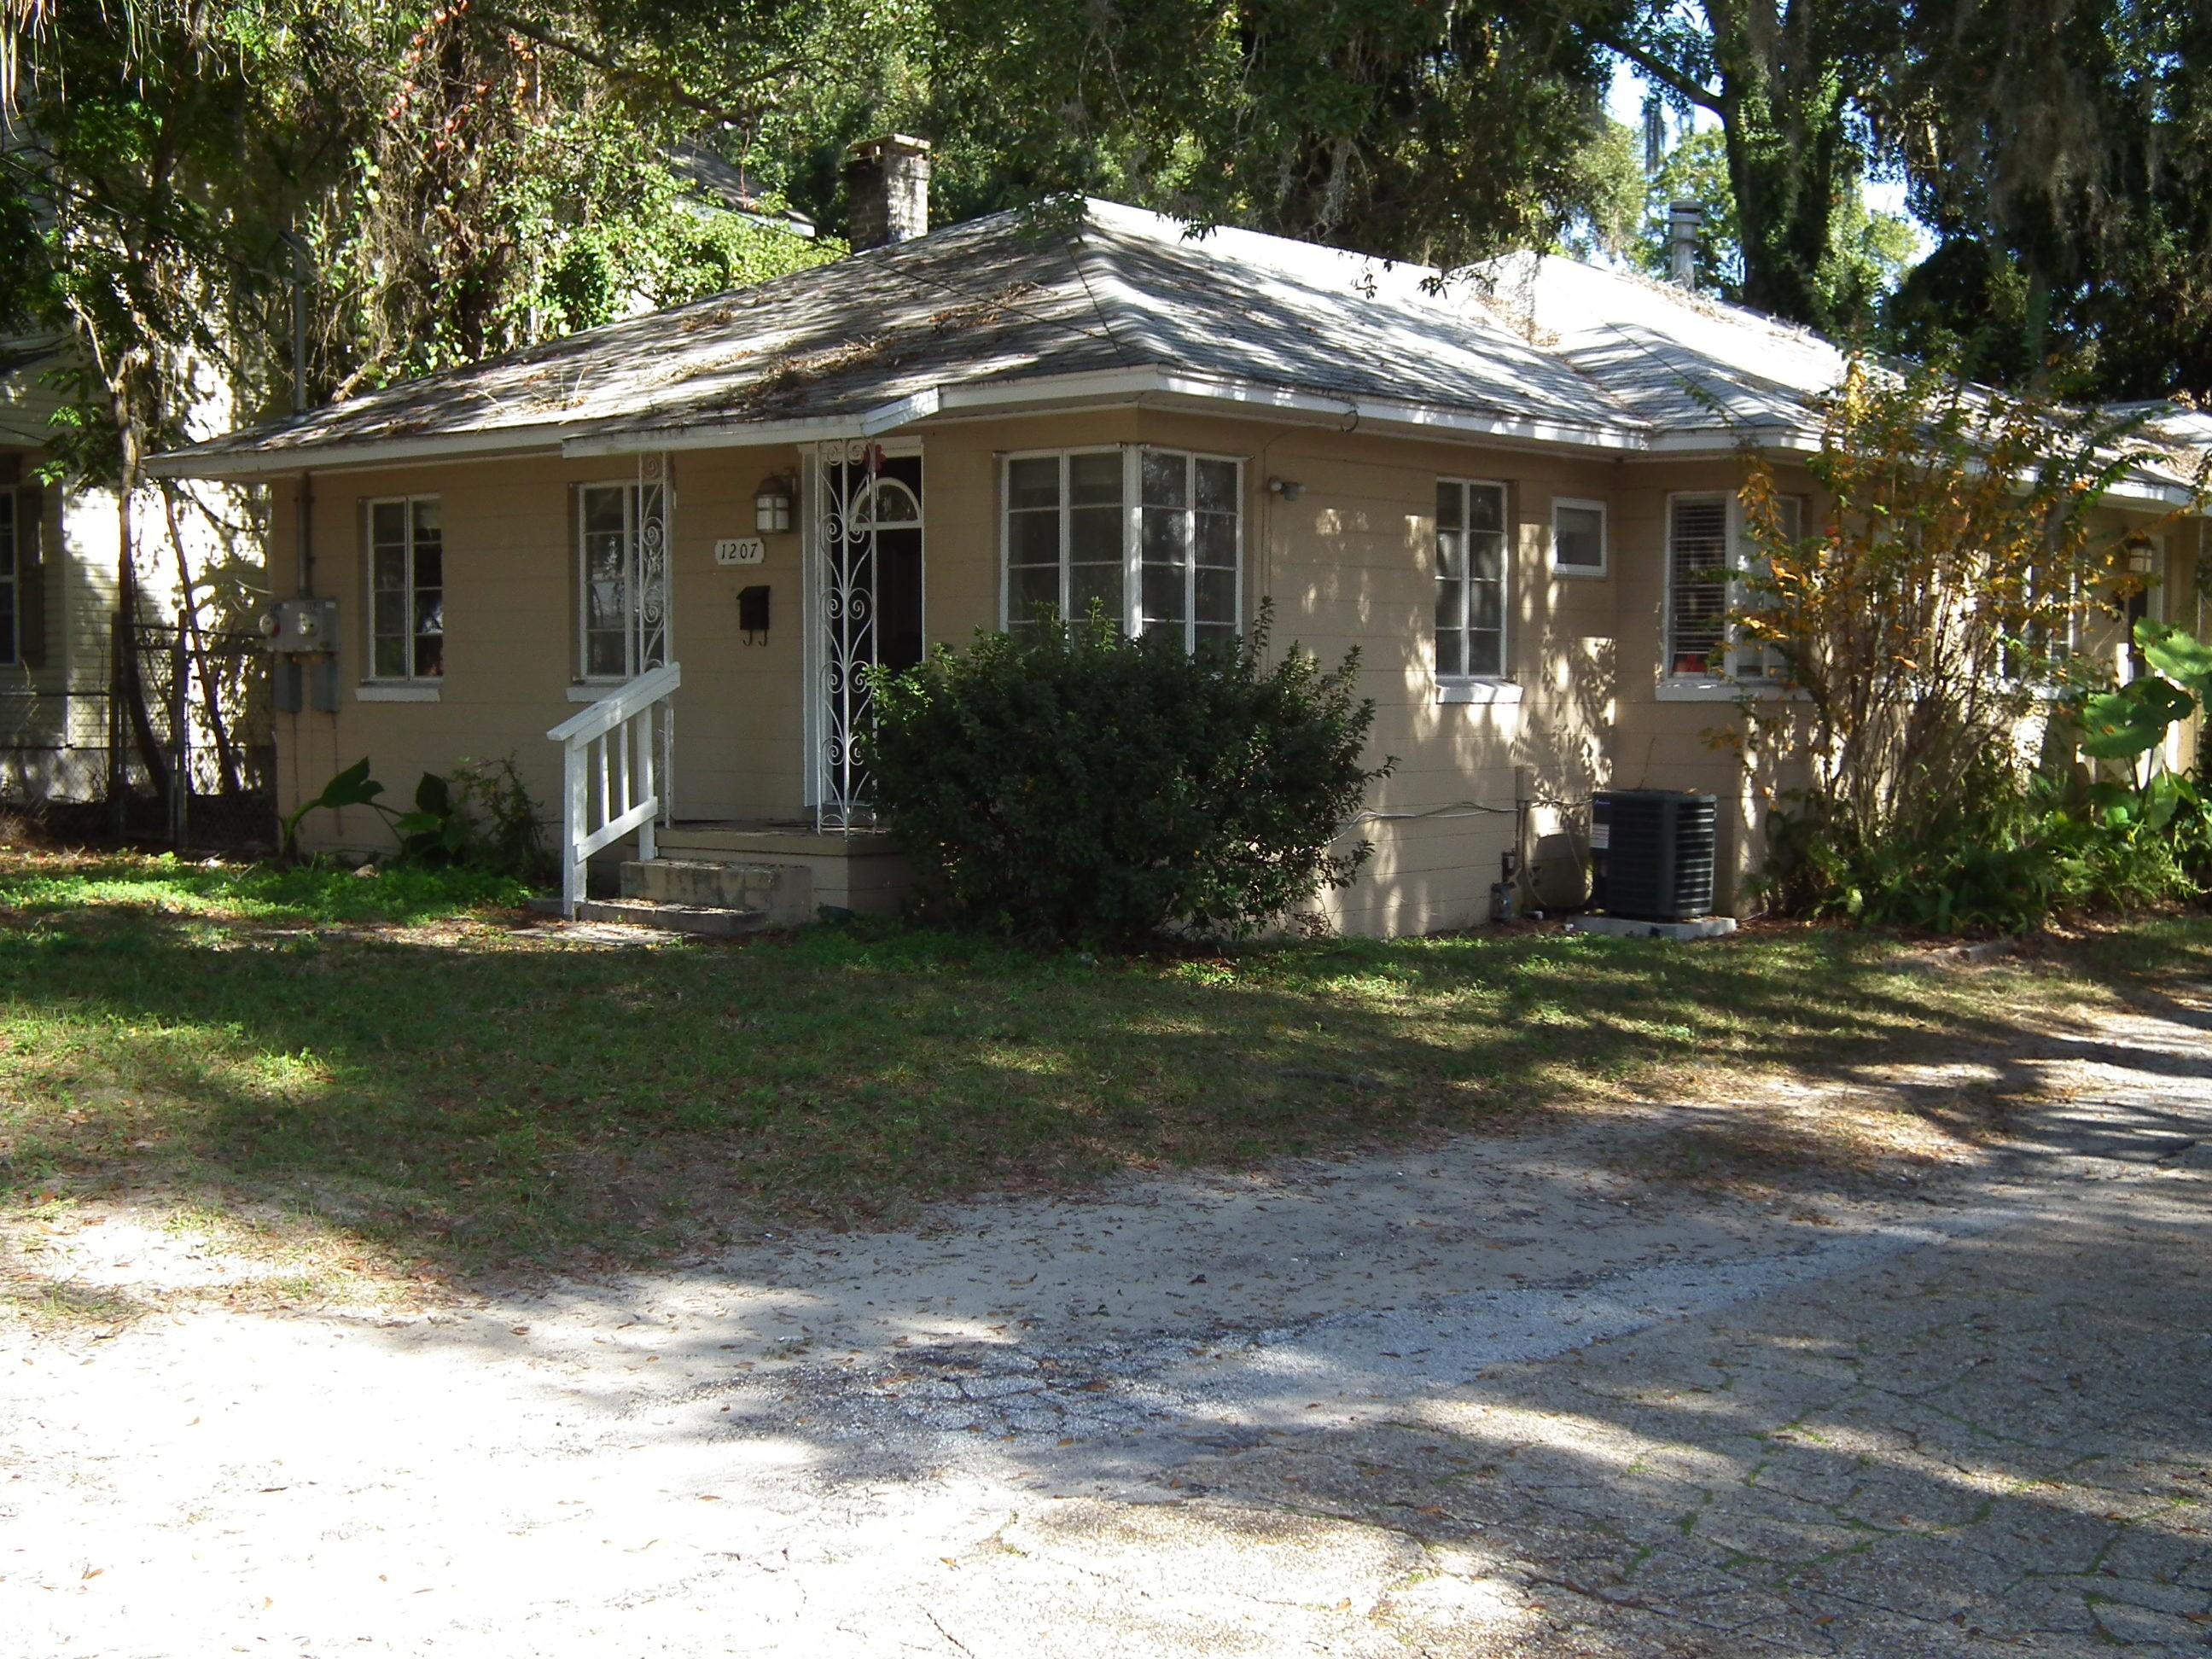 1207 Clock Street Jacksonville Fl 32211 2 Bedroom Apartment For Rent For 650 Month Zumper